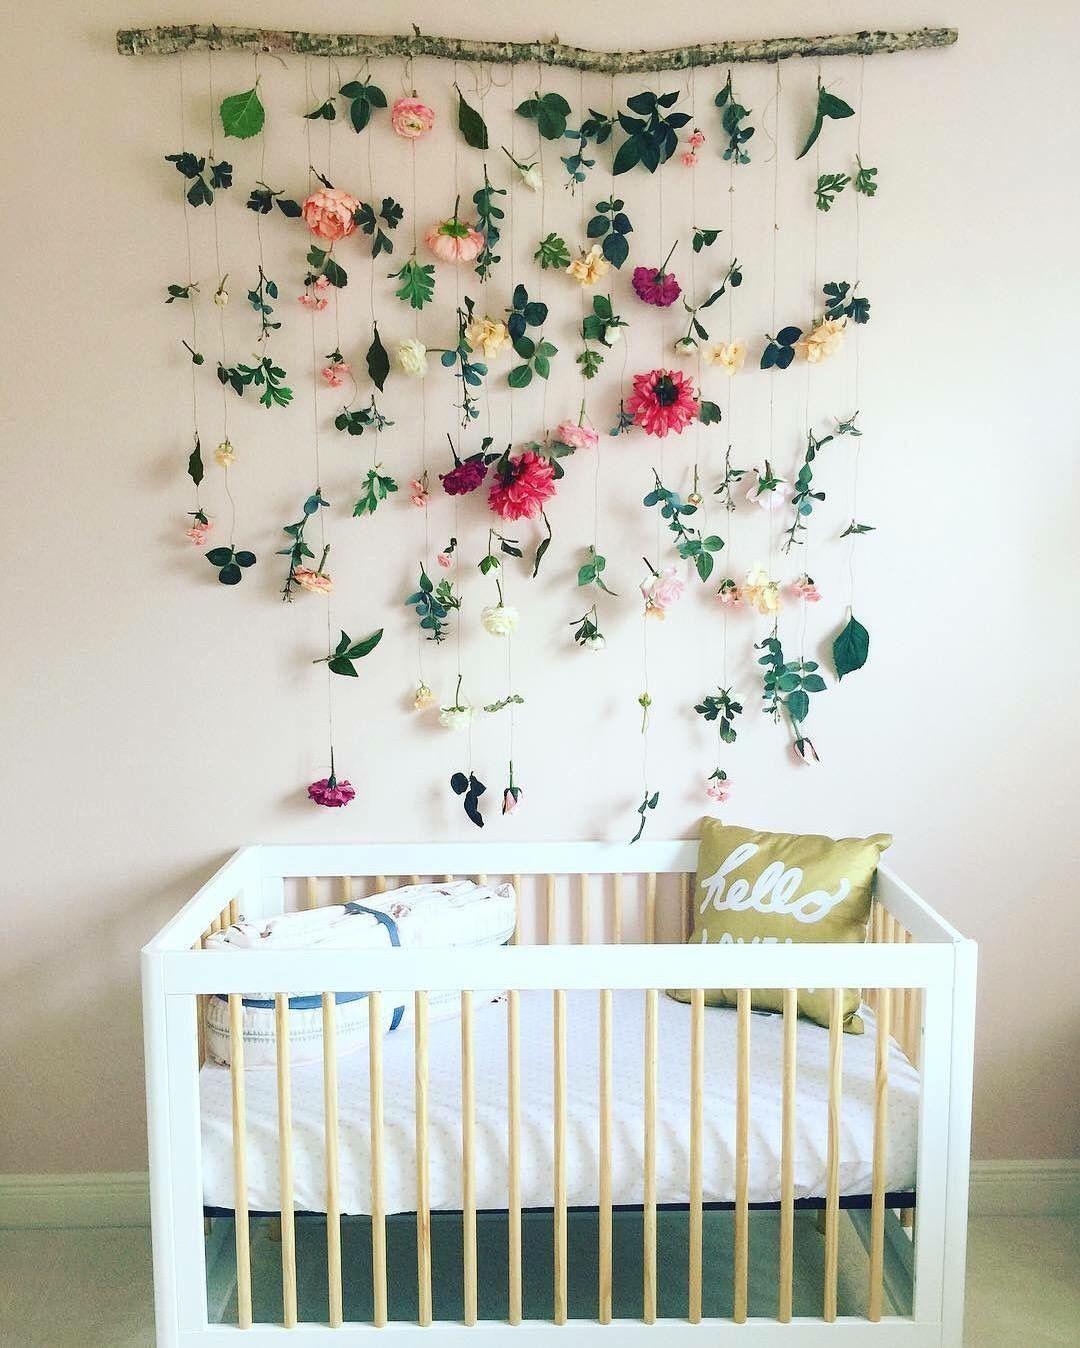 Project Nursery Nursery Decoration Idea Nursery Room Baby